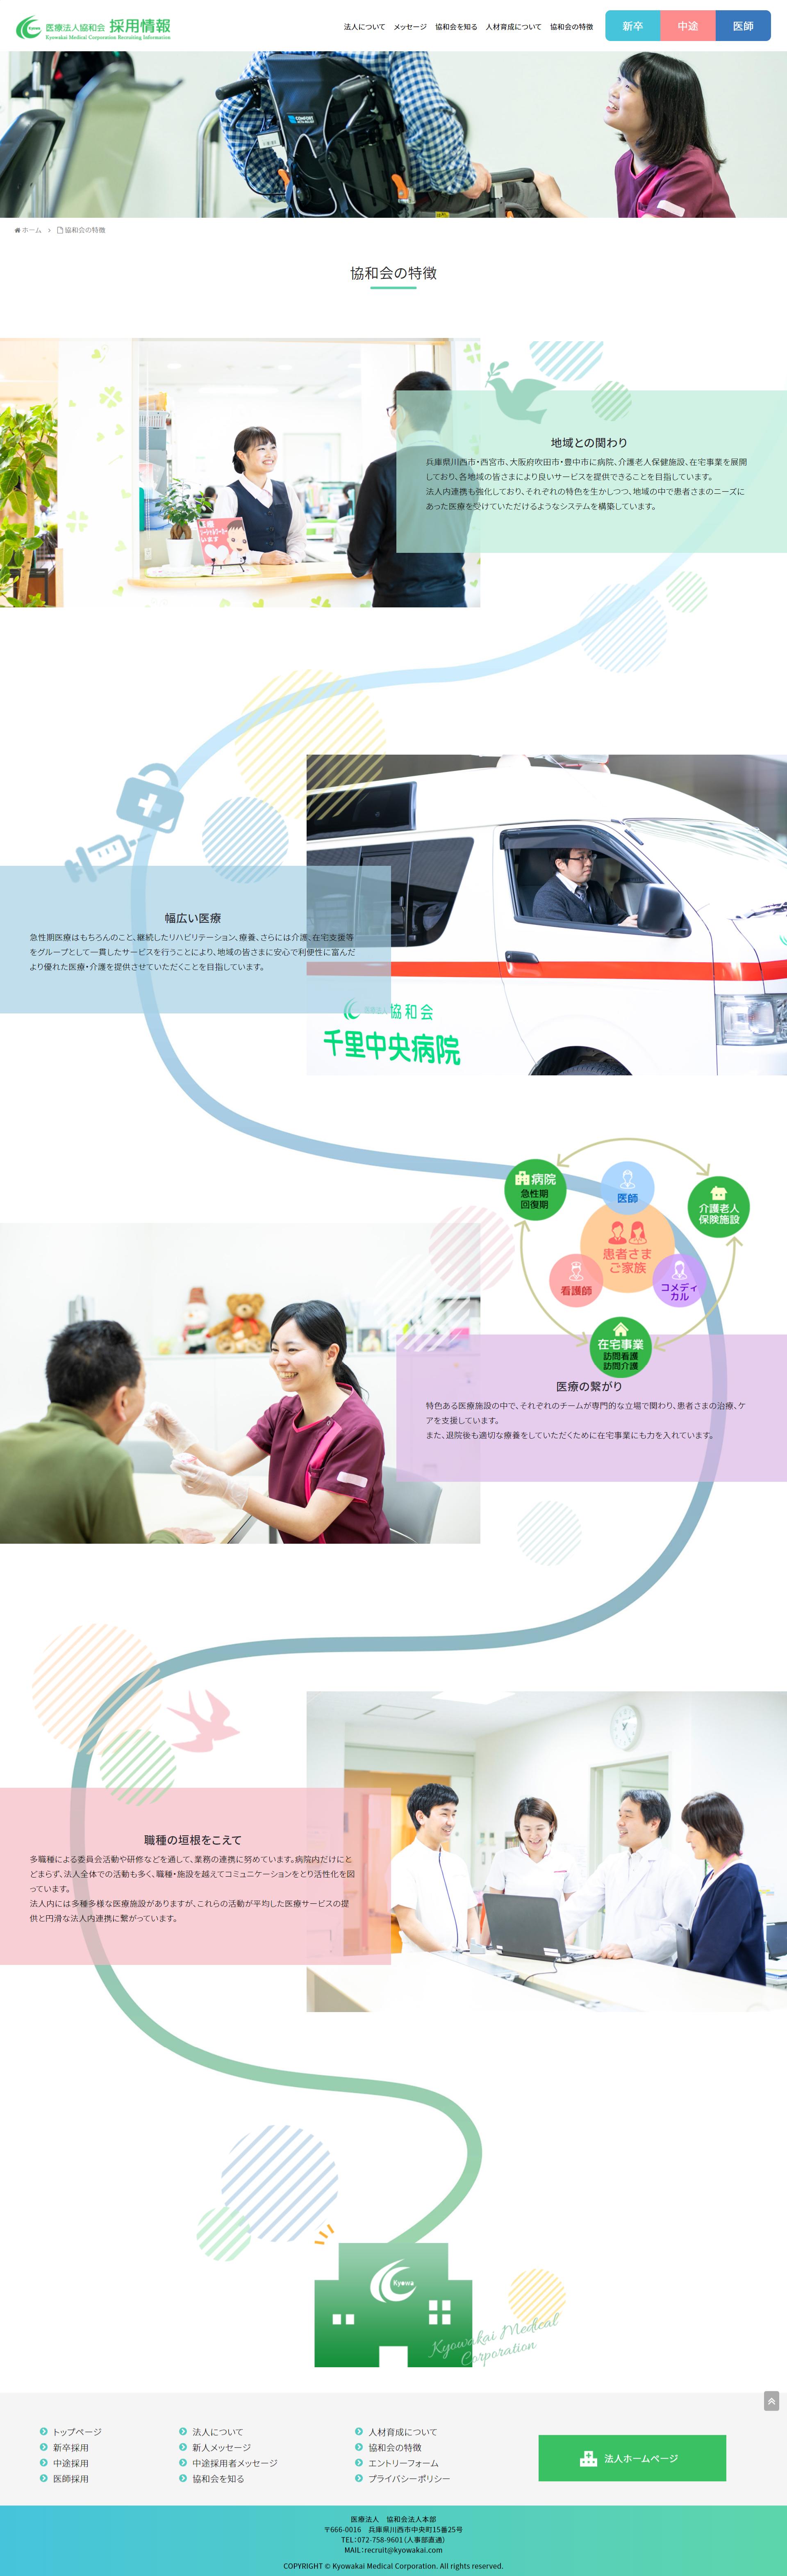 2020年4月作成「 医療法人 協和会」採用サイト_サブ画像